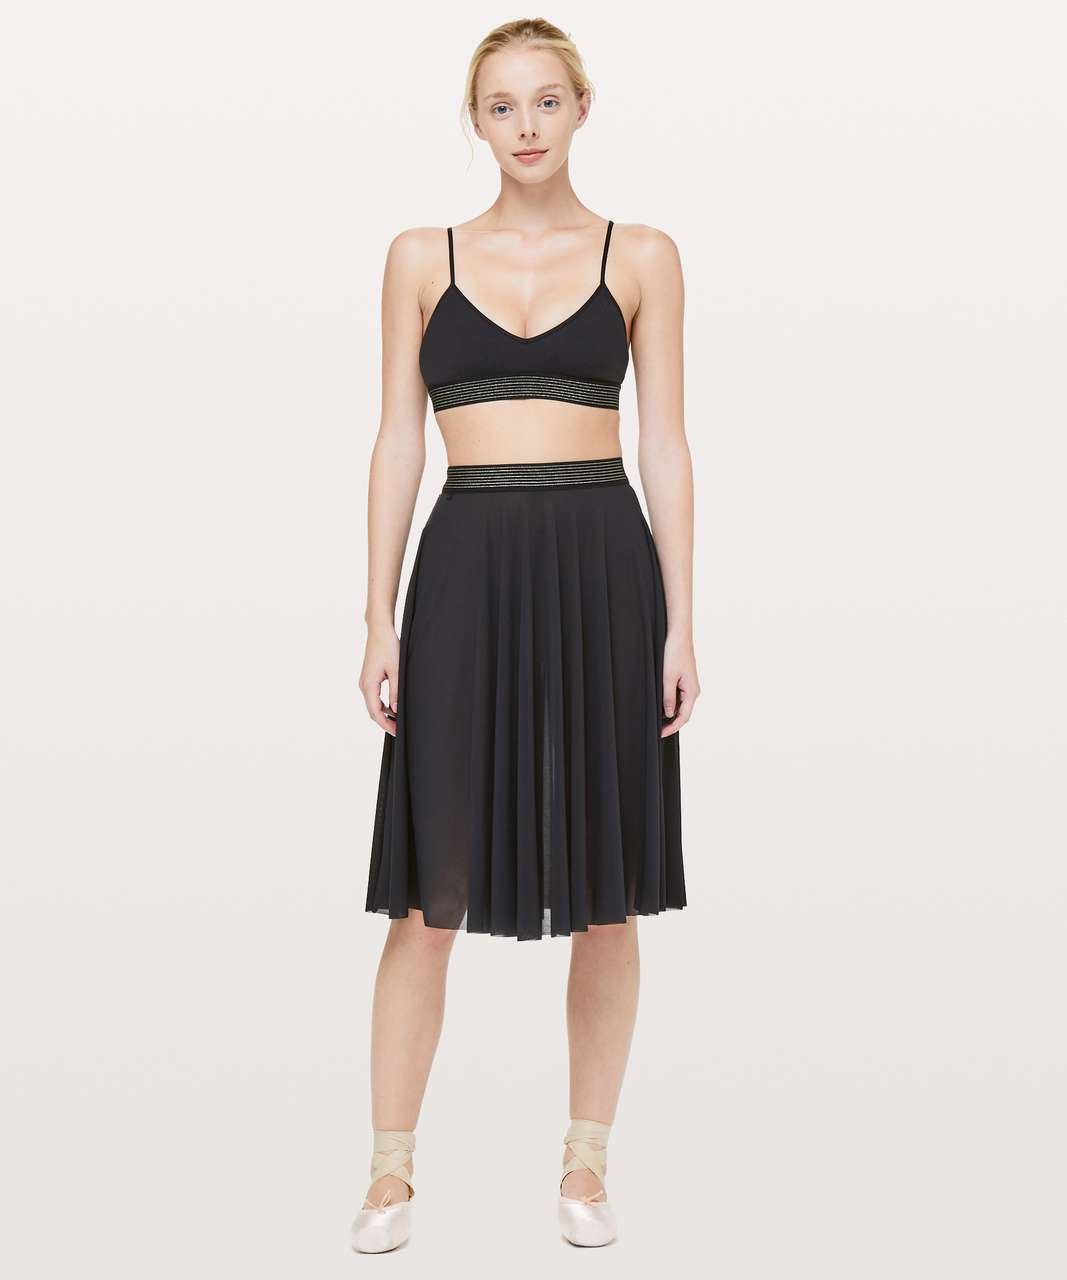 "Lululemon Principal Dancer Skirt *15"" - Black"